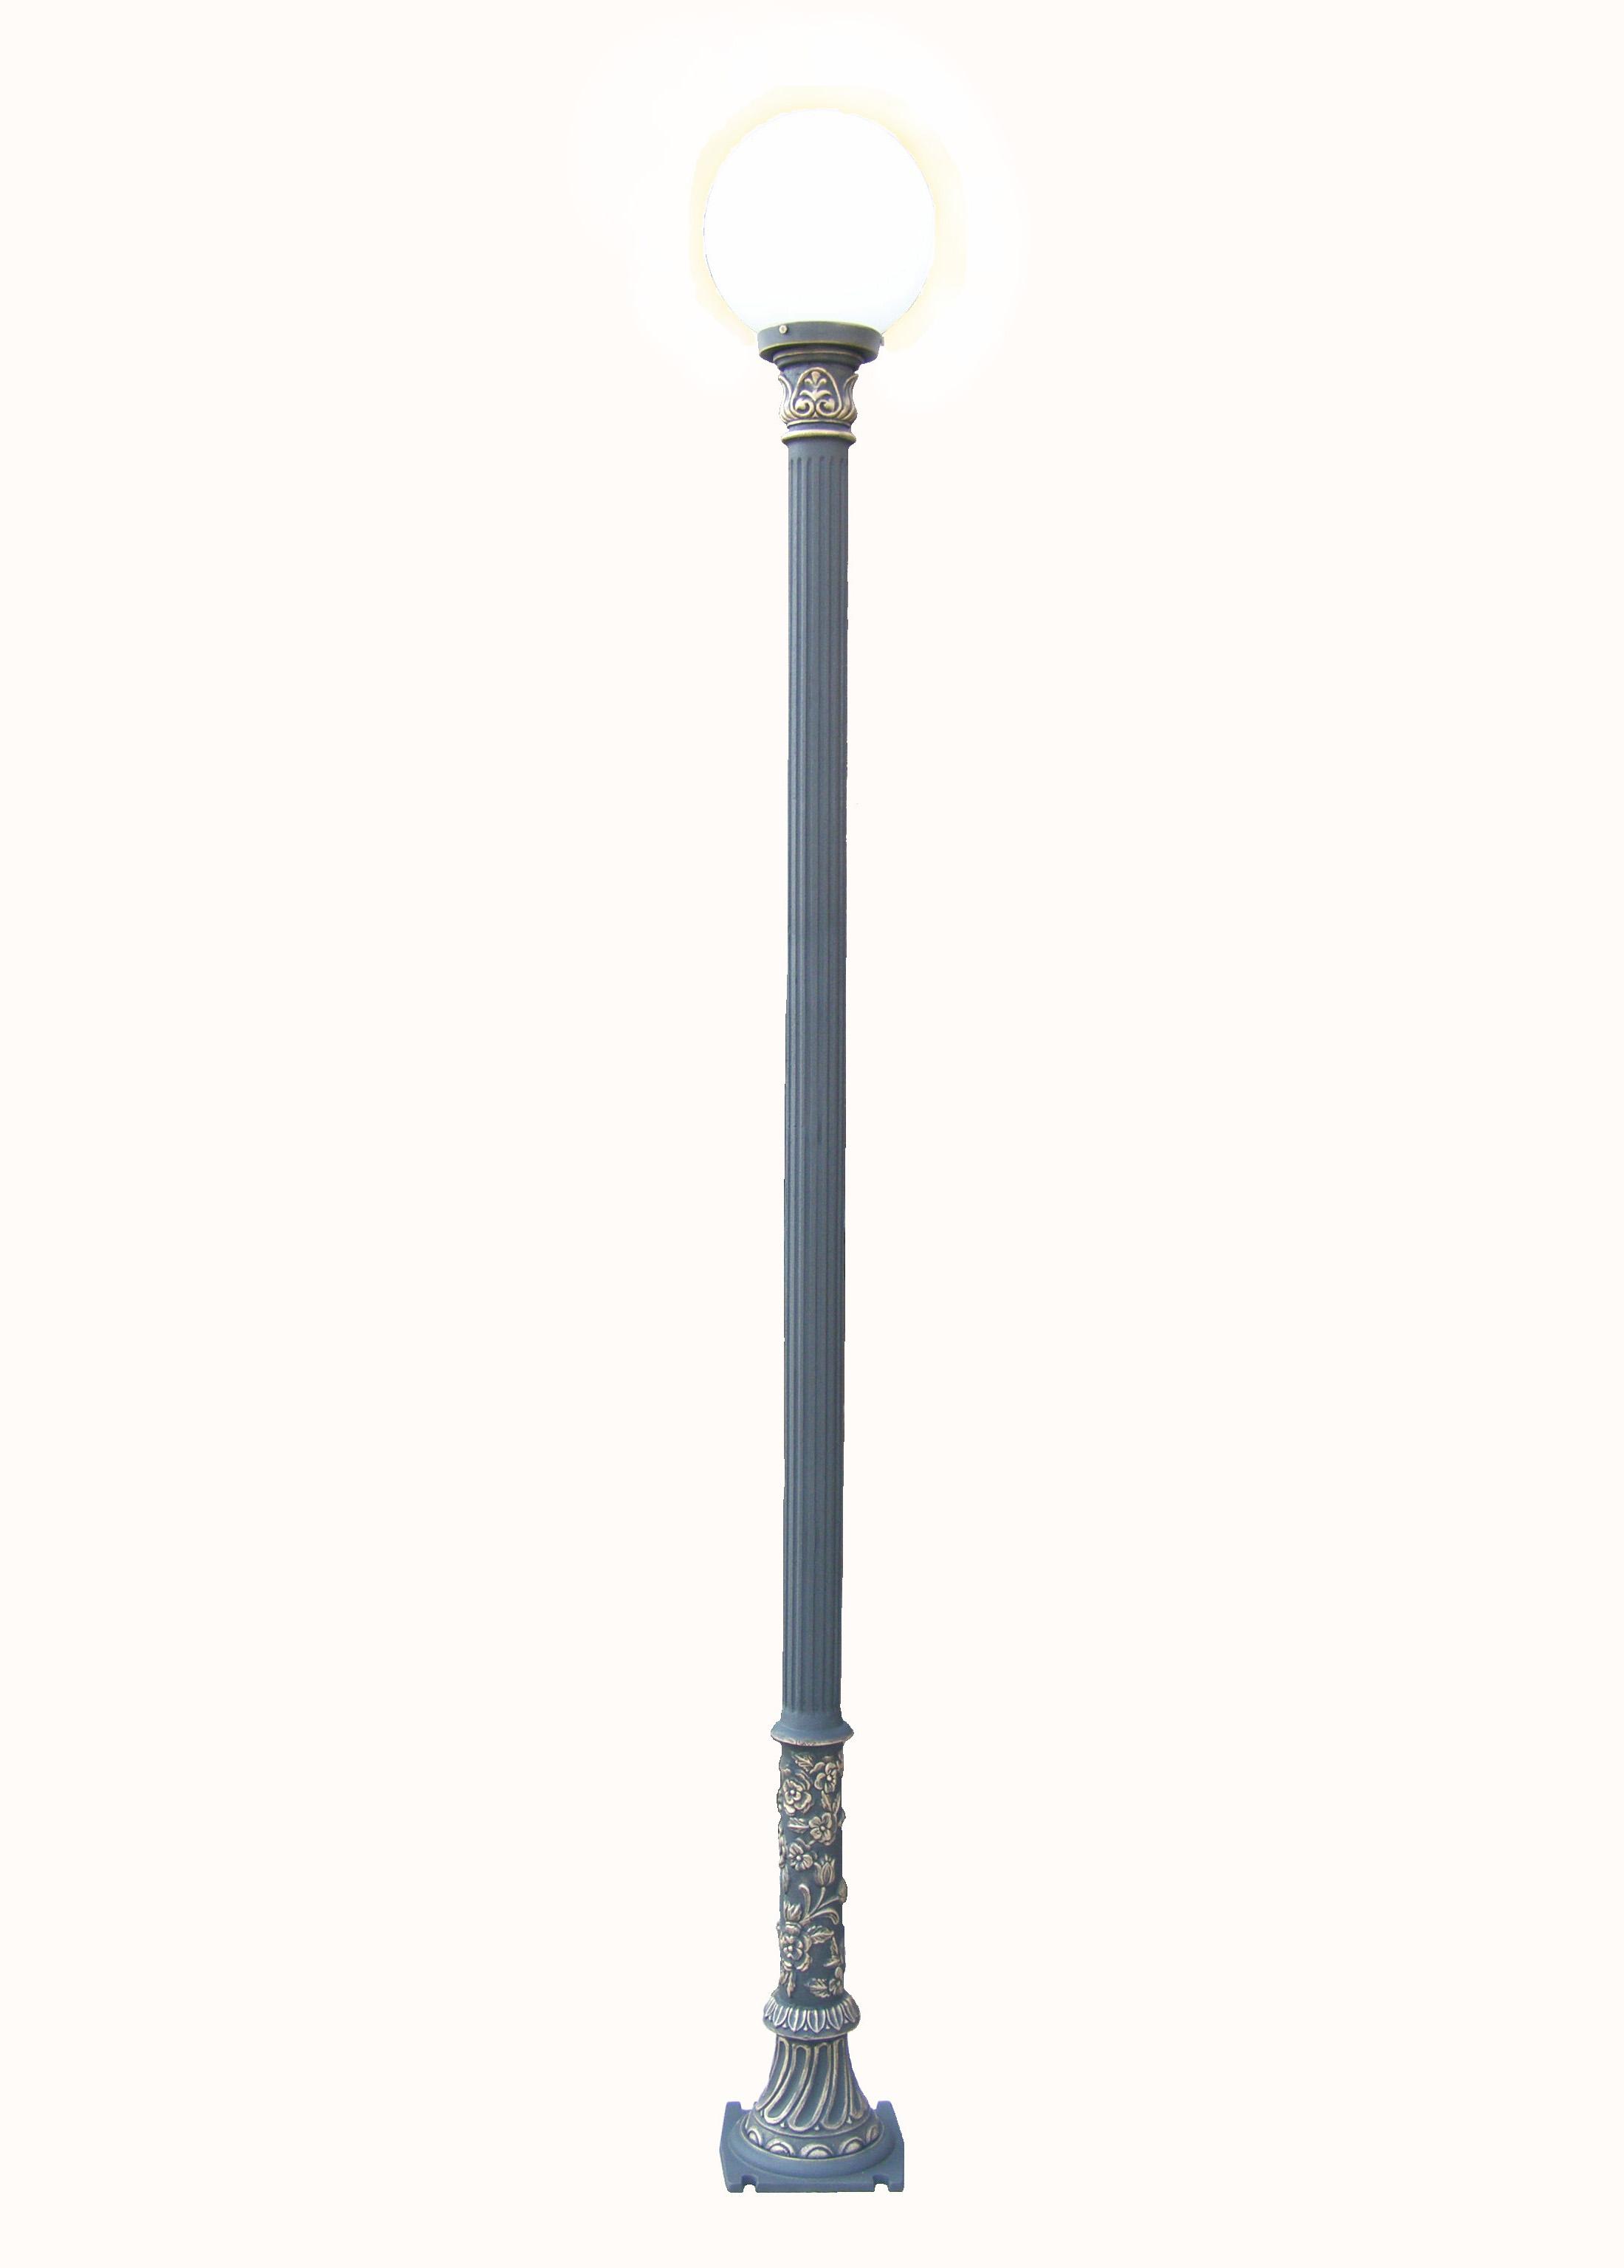 Stalpi ornamentali pentru iluminat stradal, parcuri, gradini BRAMAL LIGHT - Poza 8